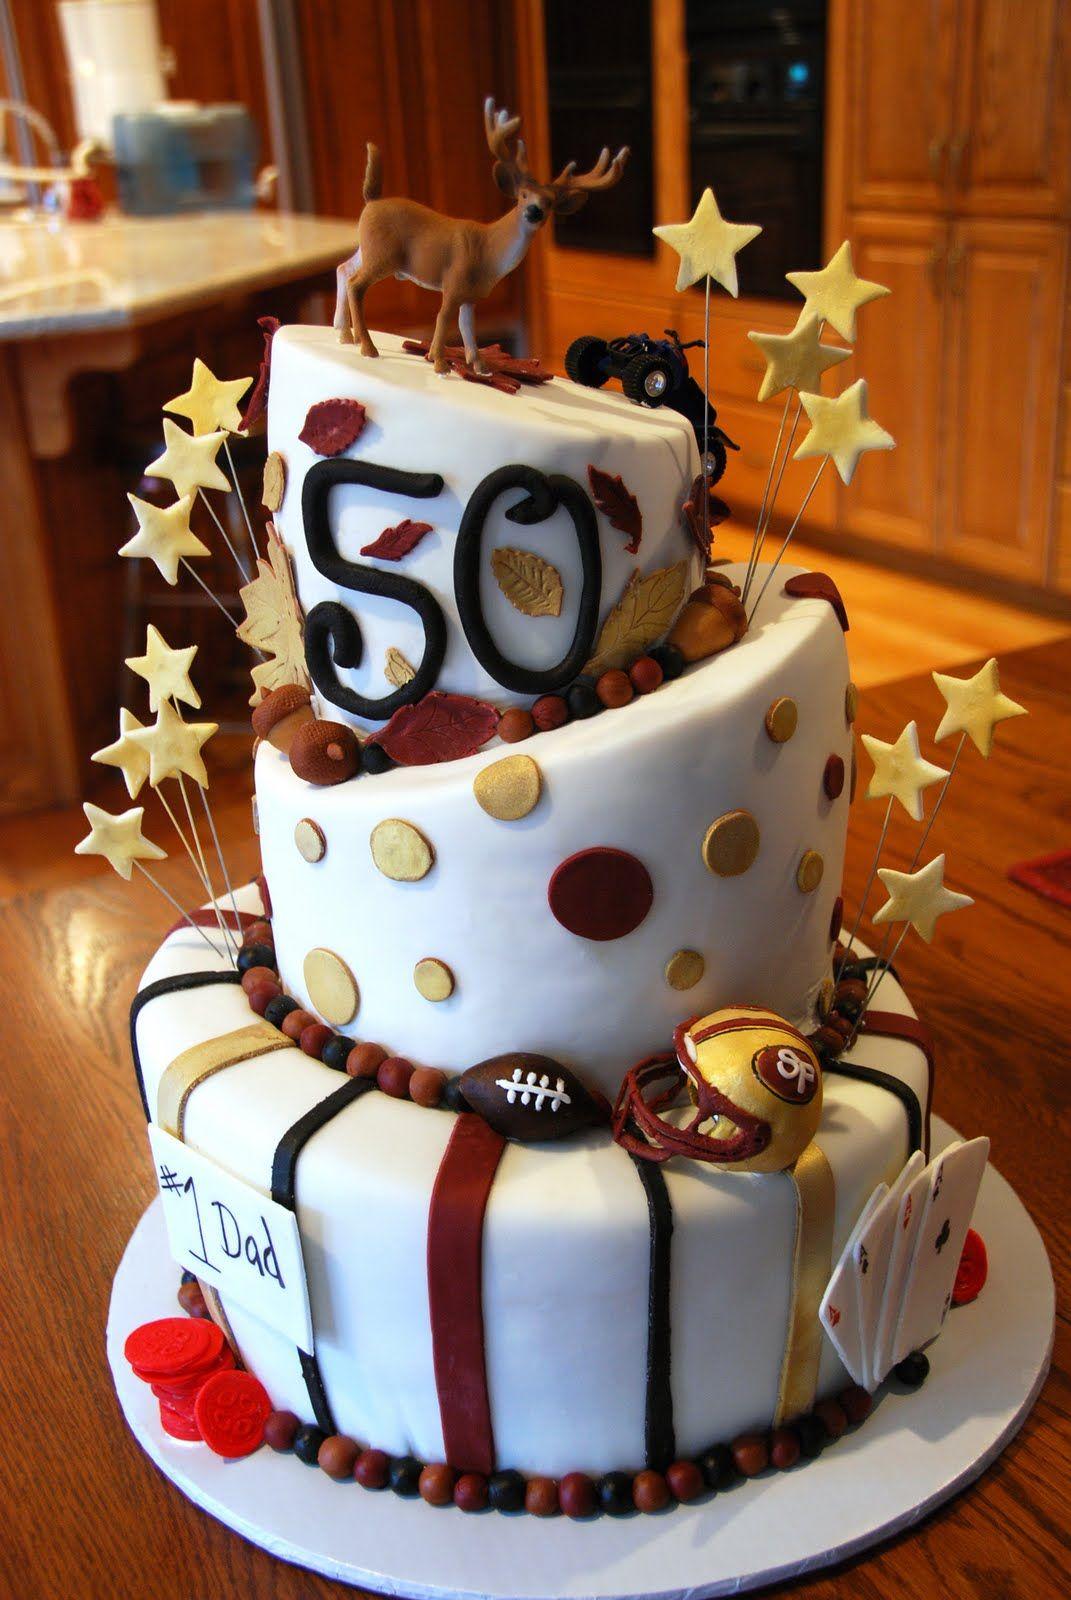 CupeeCakes 50th Birthday Cake Funny 50th birthday